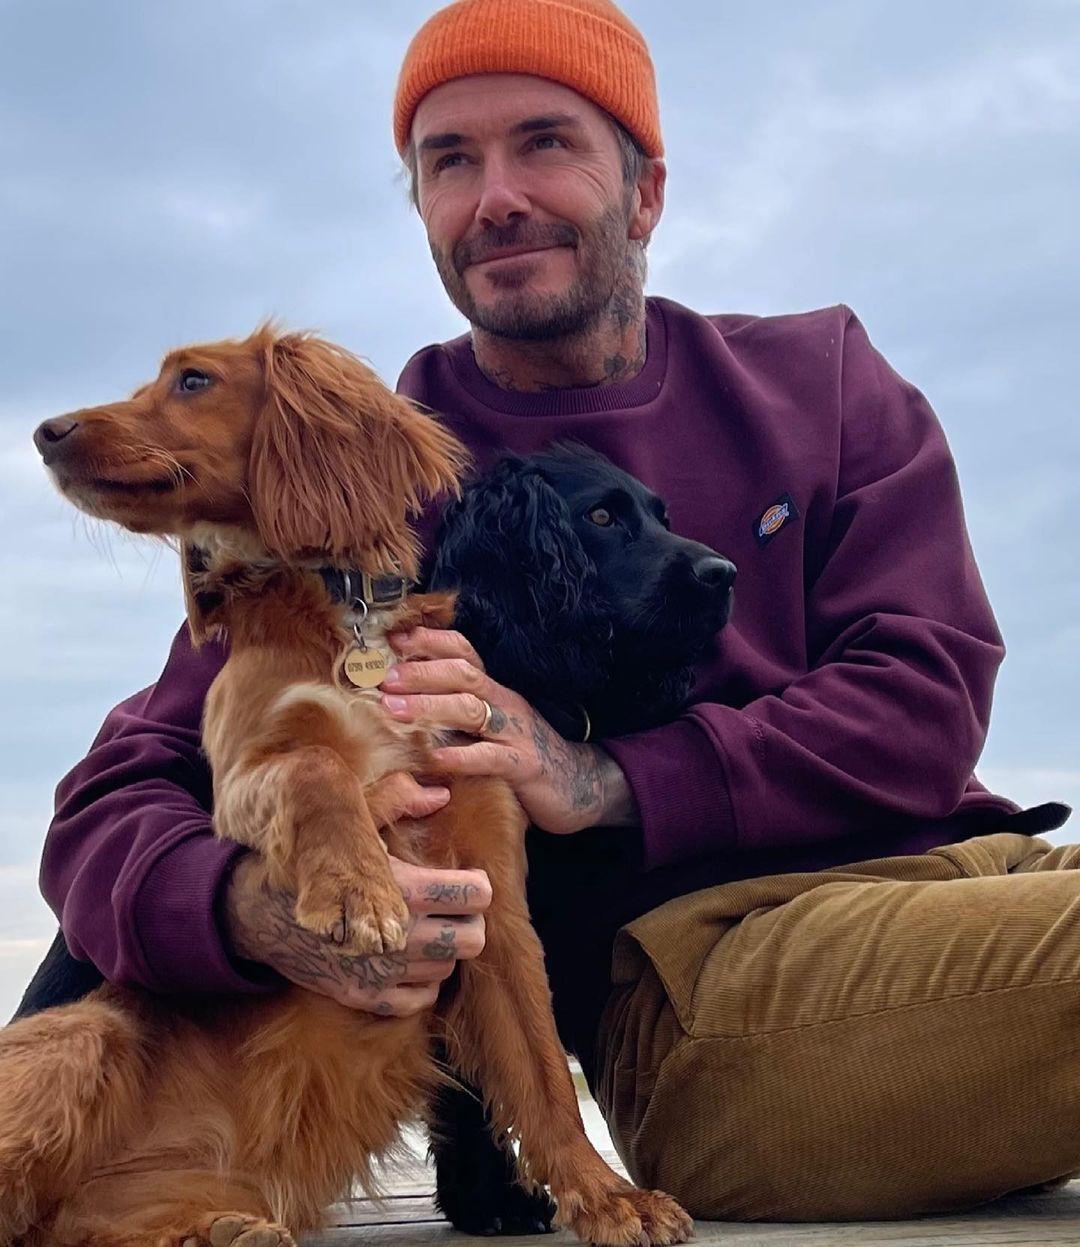 بيكهام وكلابه من نوعيه كوكر